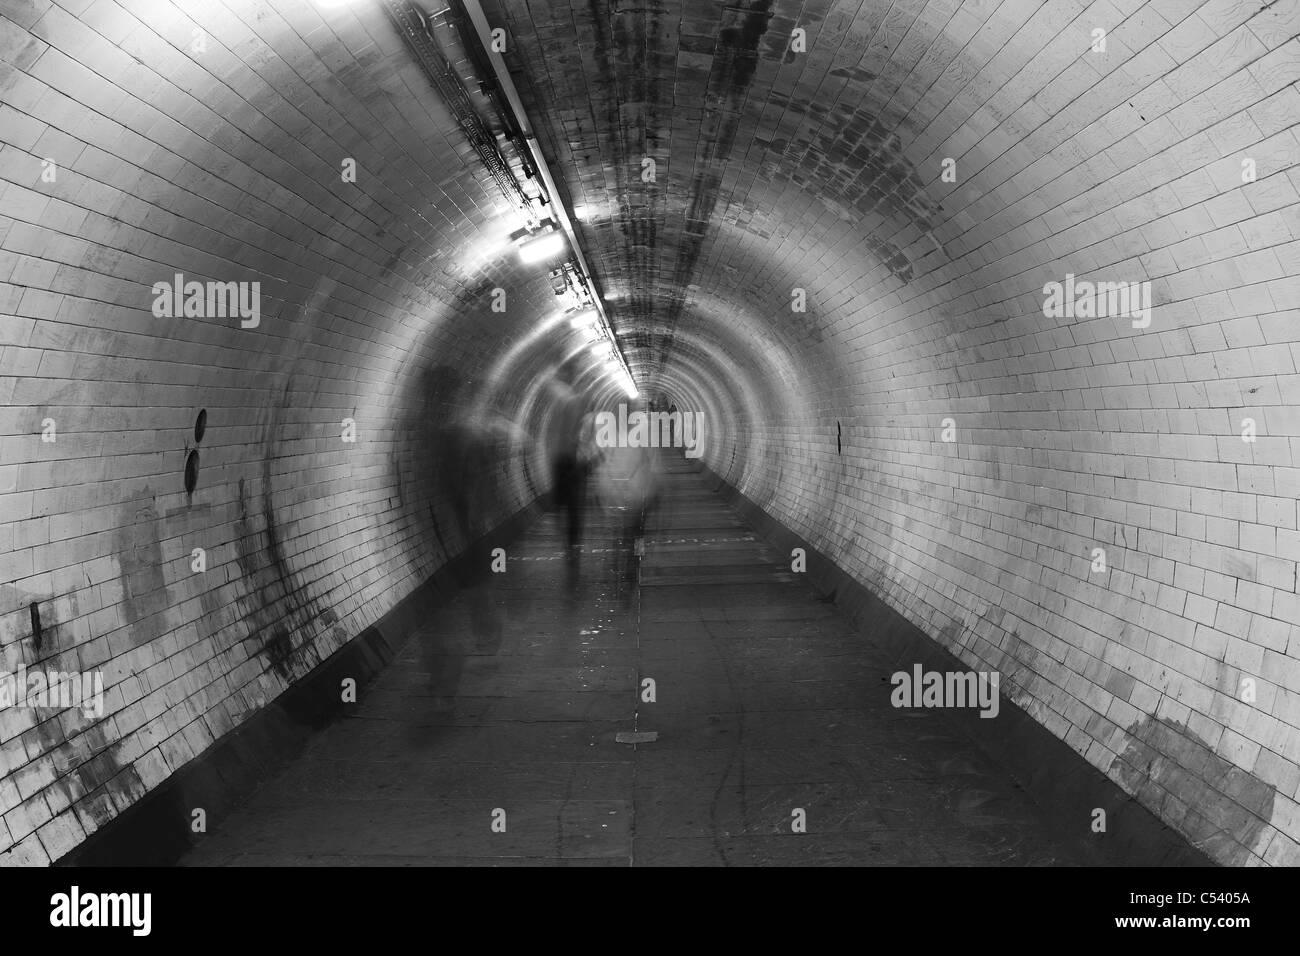 Pedestrian Subway - Stock Image